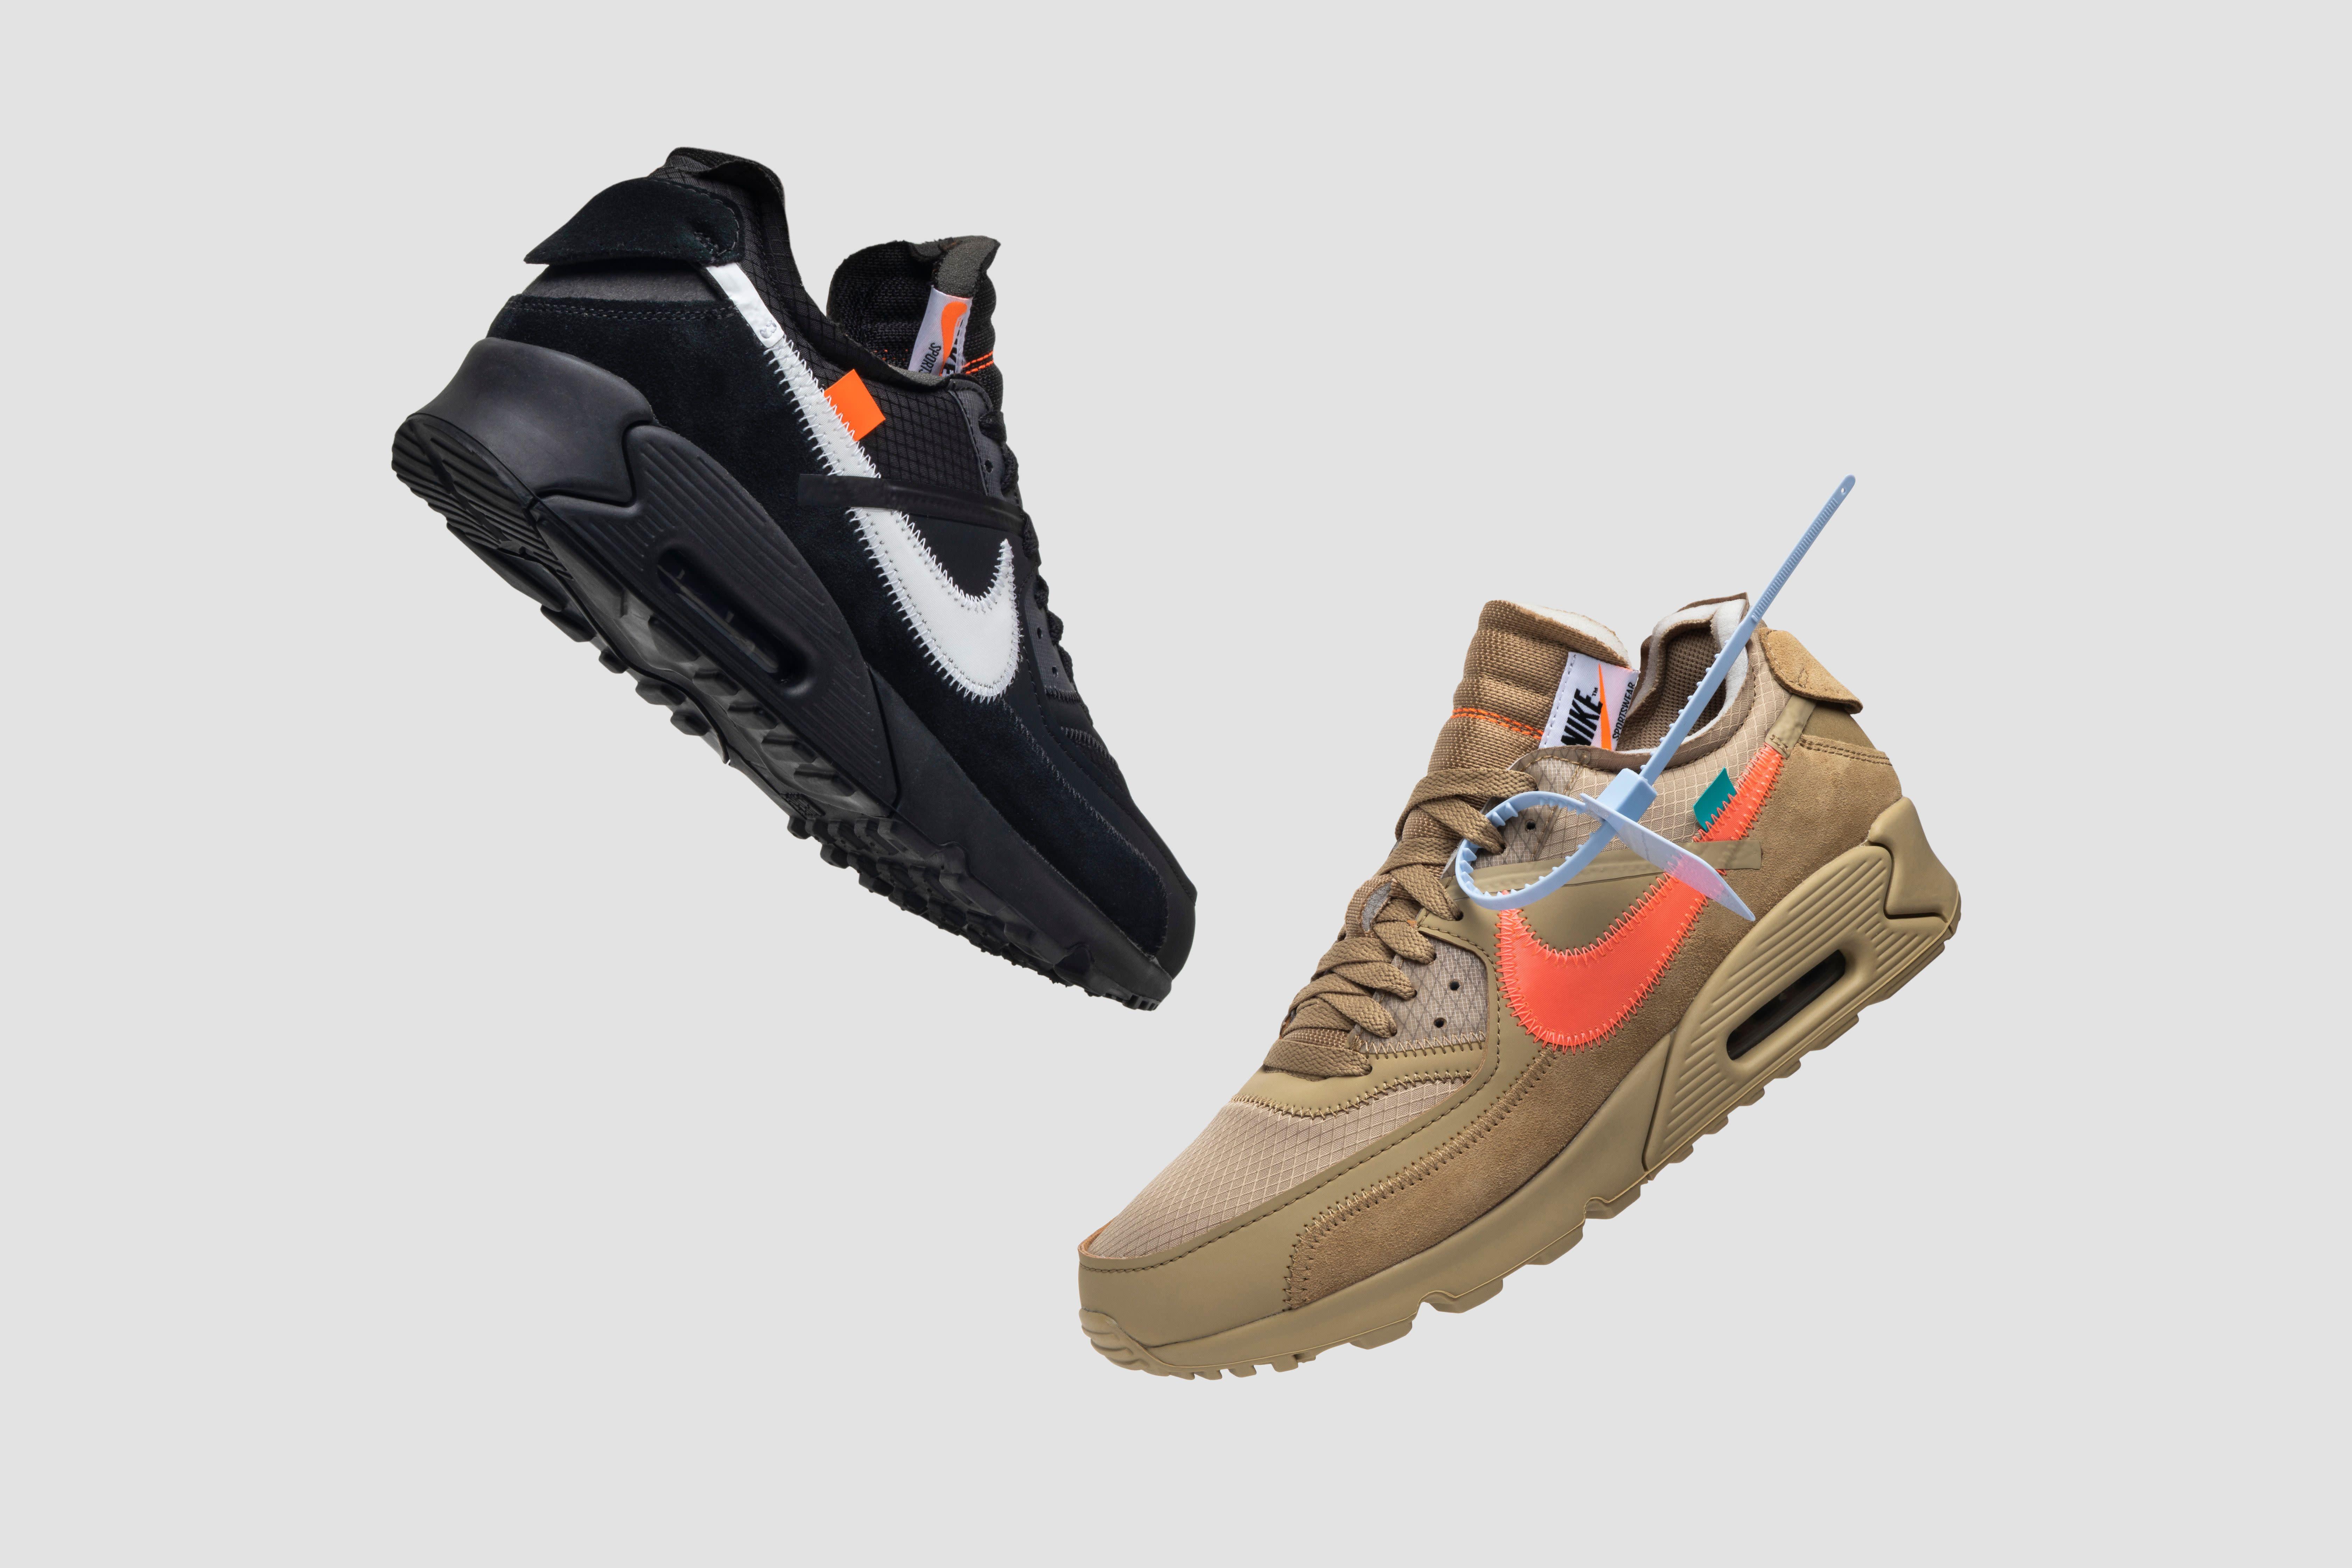 online retailer 70540 0b8e3 Foot Locker makes  100M bet on popular online sneaker marketplace GOAT